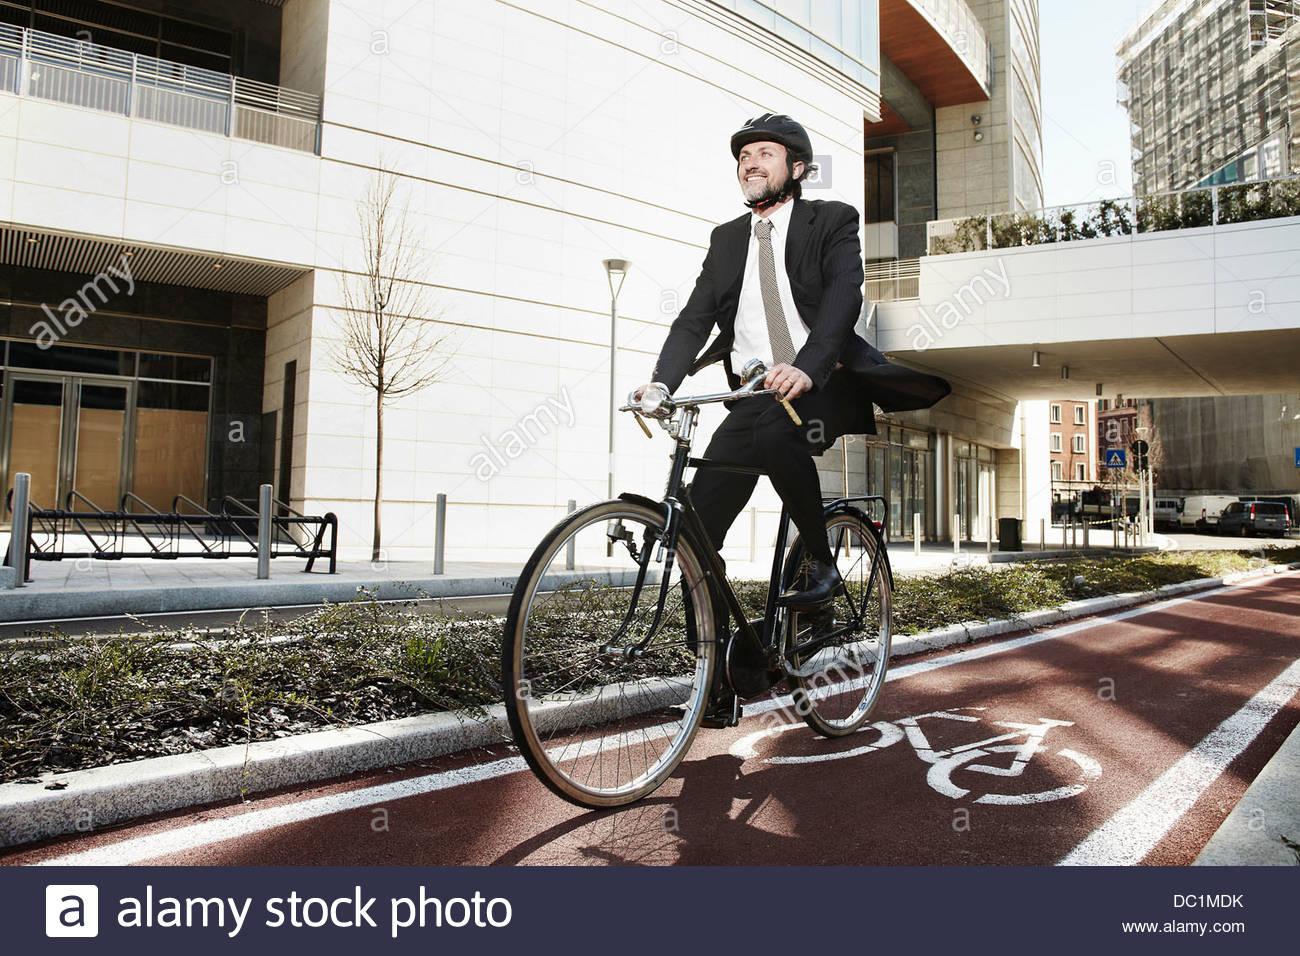 Mitte adult Geschäftsmann Reiten Fahrrad am Radweg Stockbild